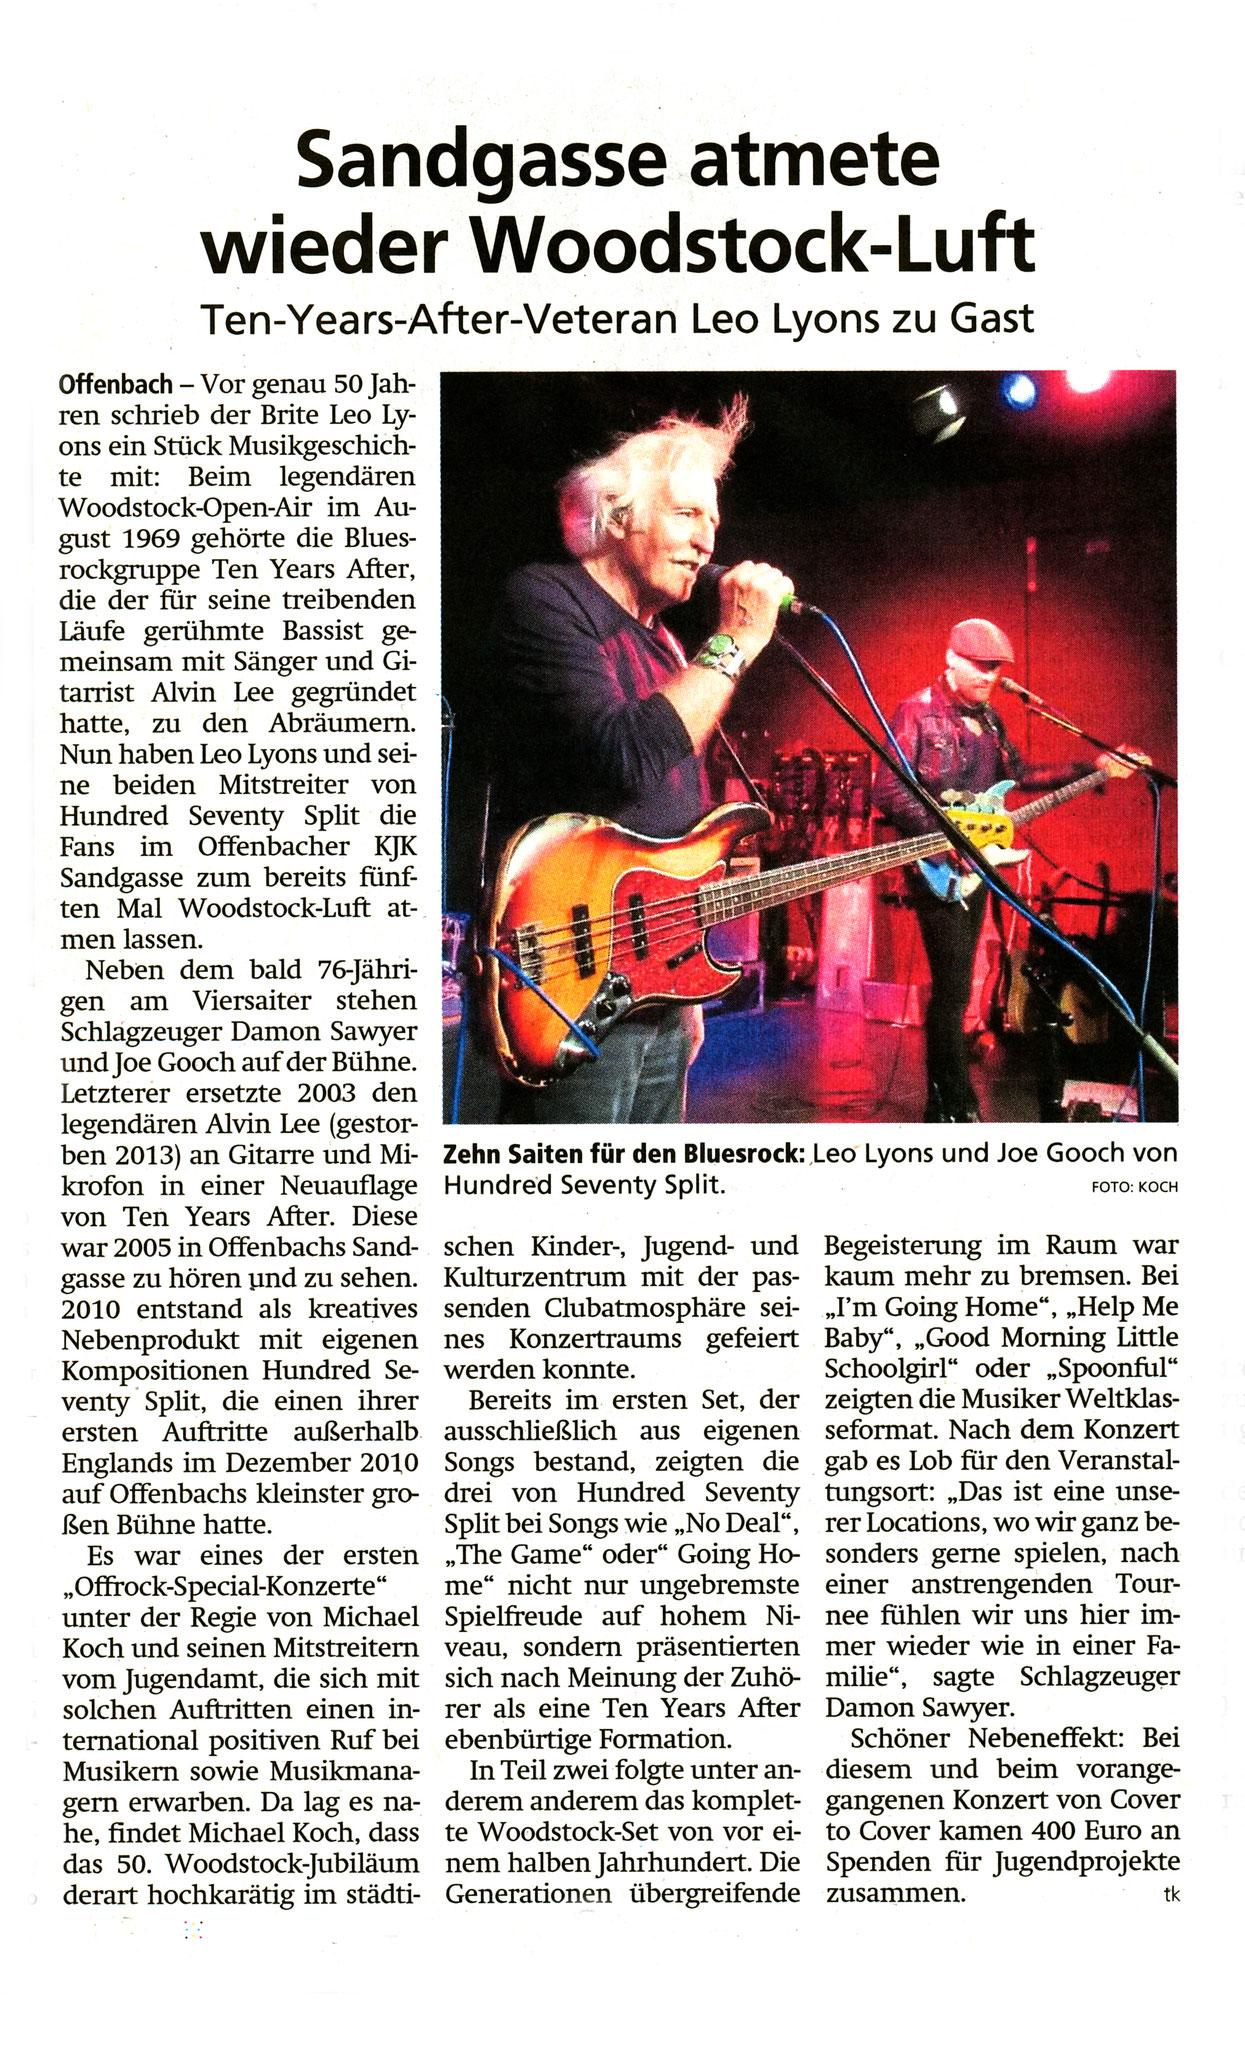 Offenbach Post, 25. Oktober 2019